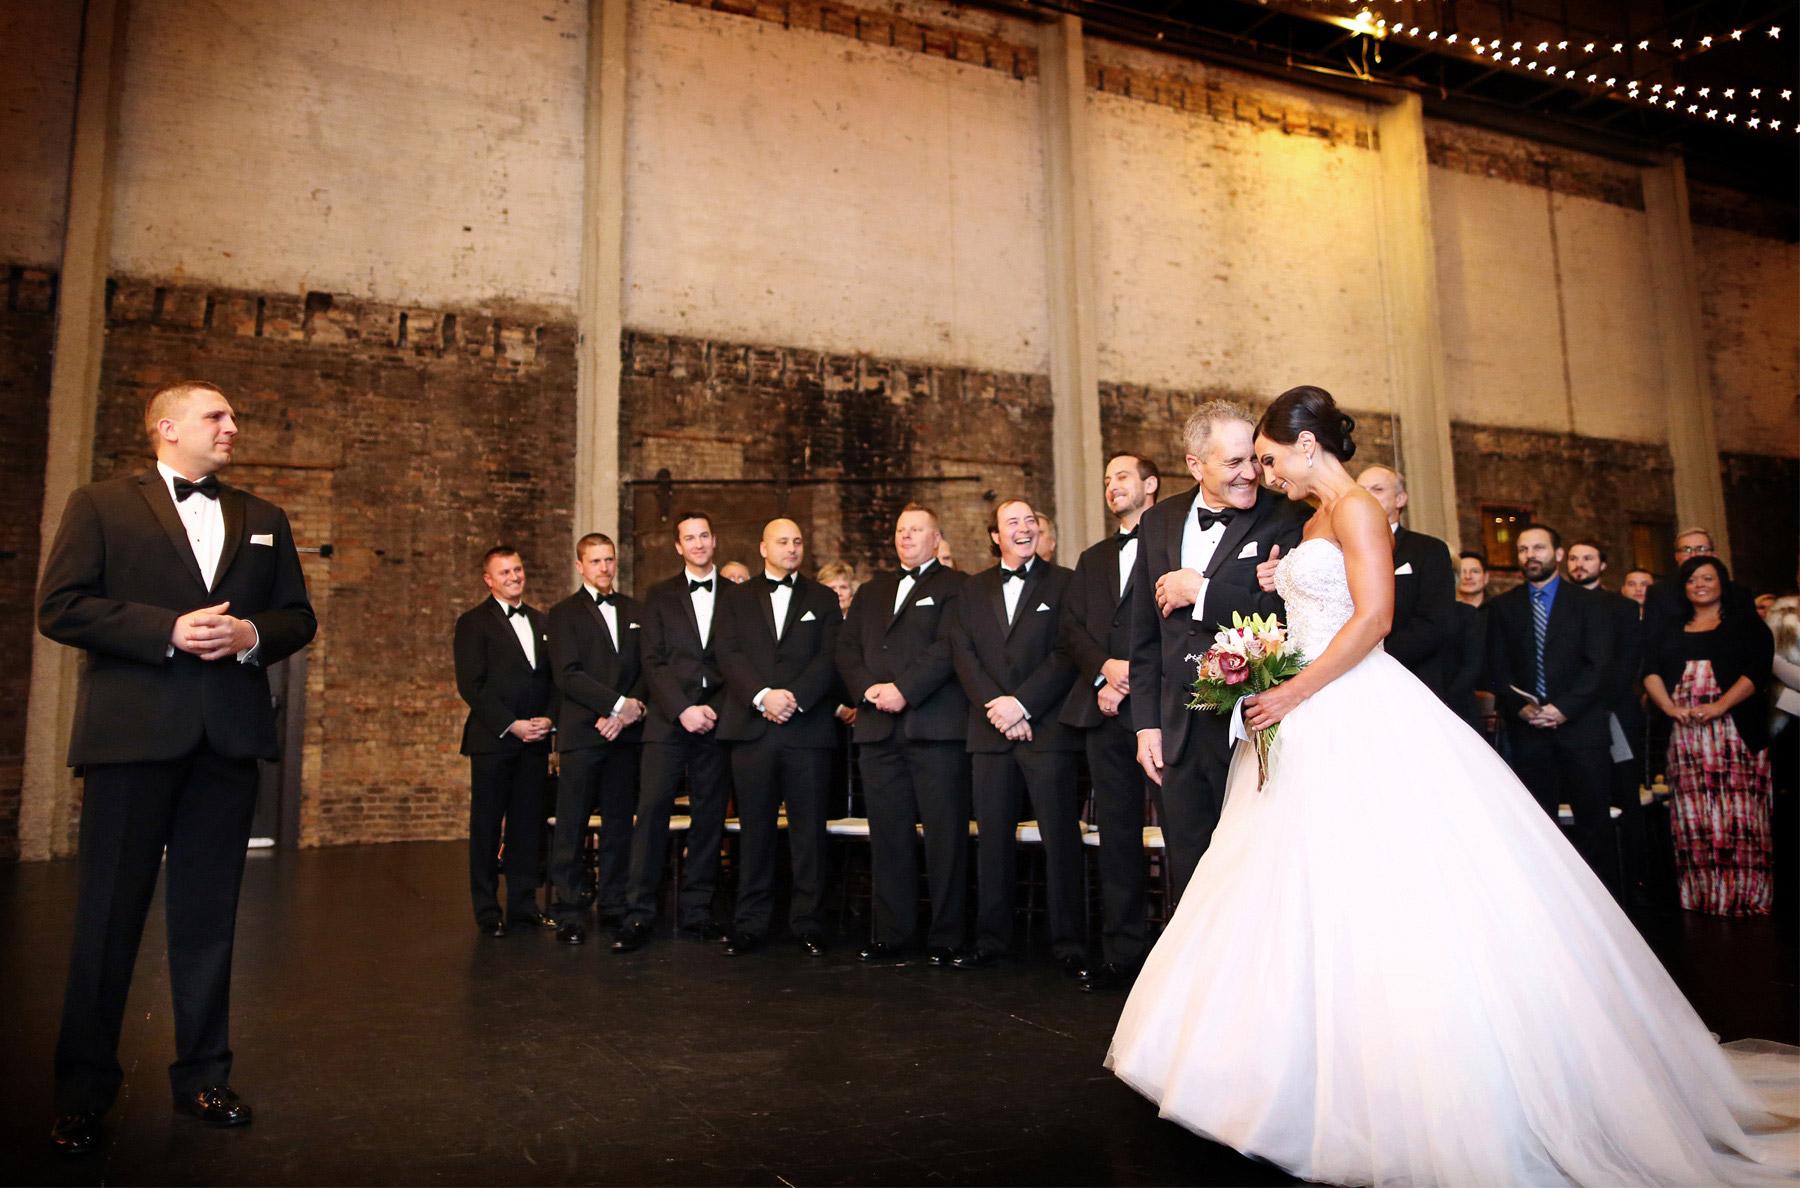 11-Minneapolis-Minnesota-Wedding-Photography-Aria-Downtown-Industrial-Ceremony-Melanie-and-Andrew.jpg